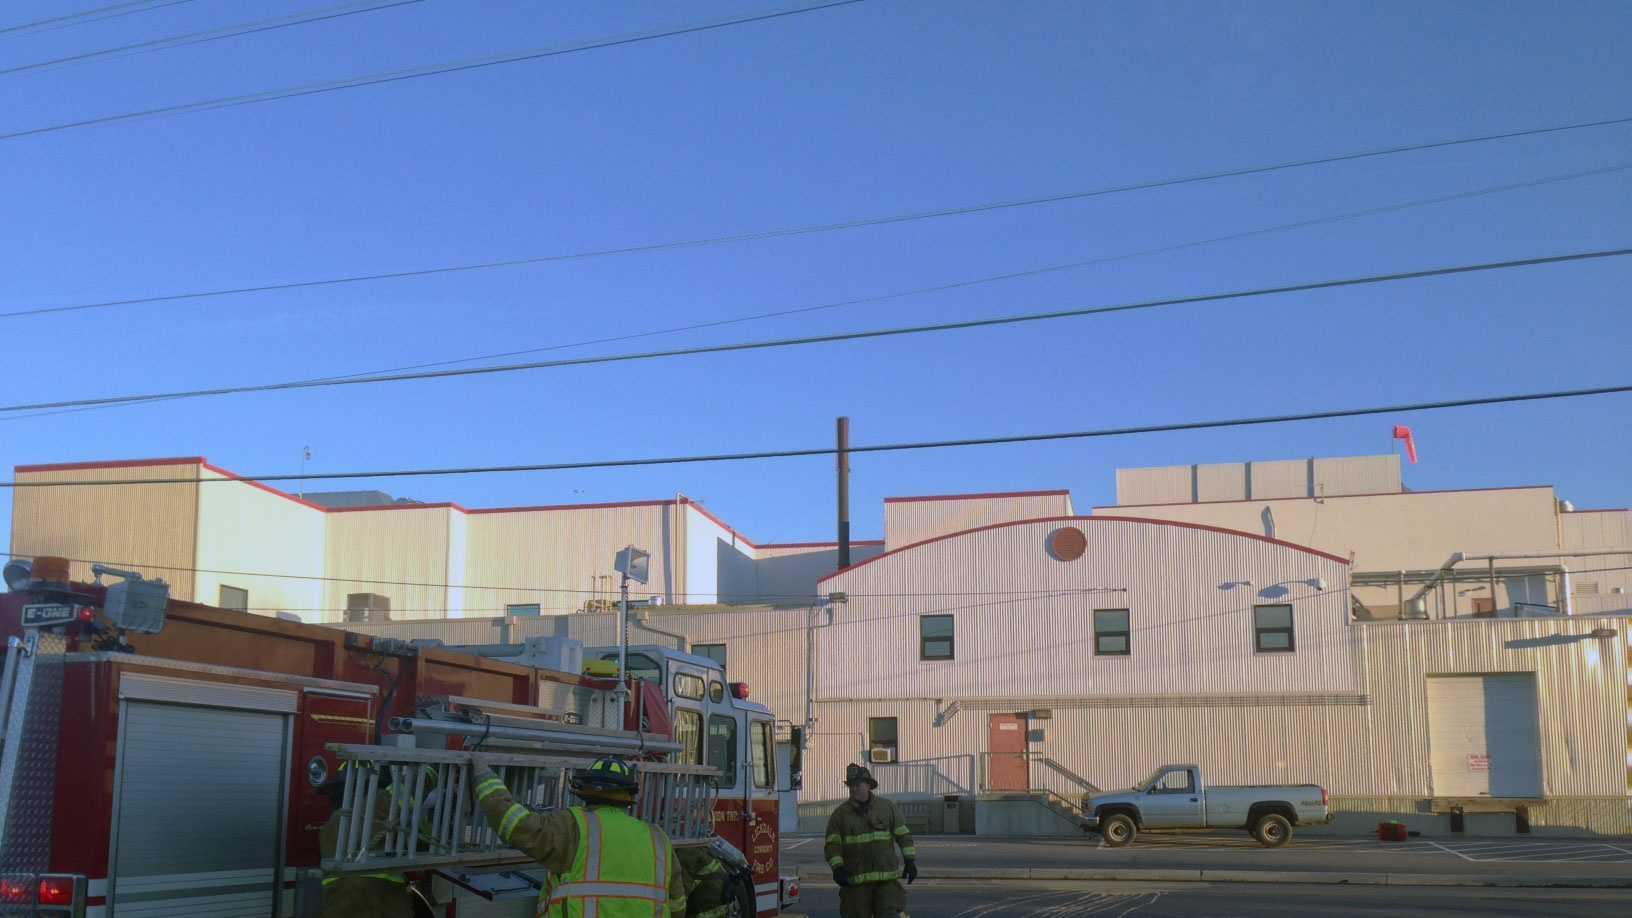 11.14 Lebanon County fire